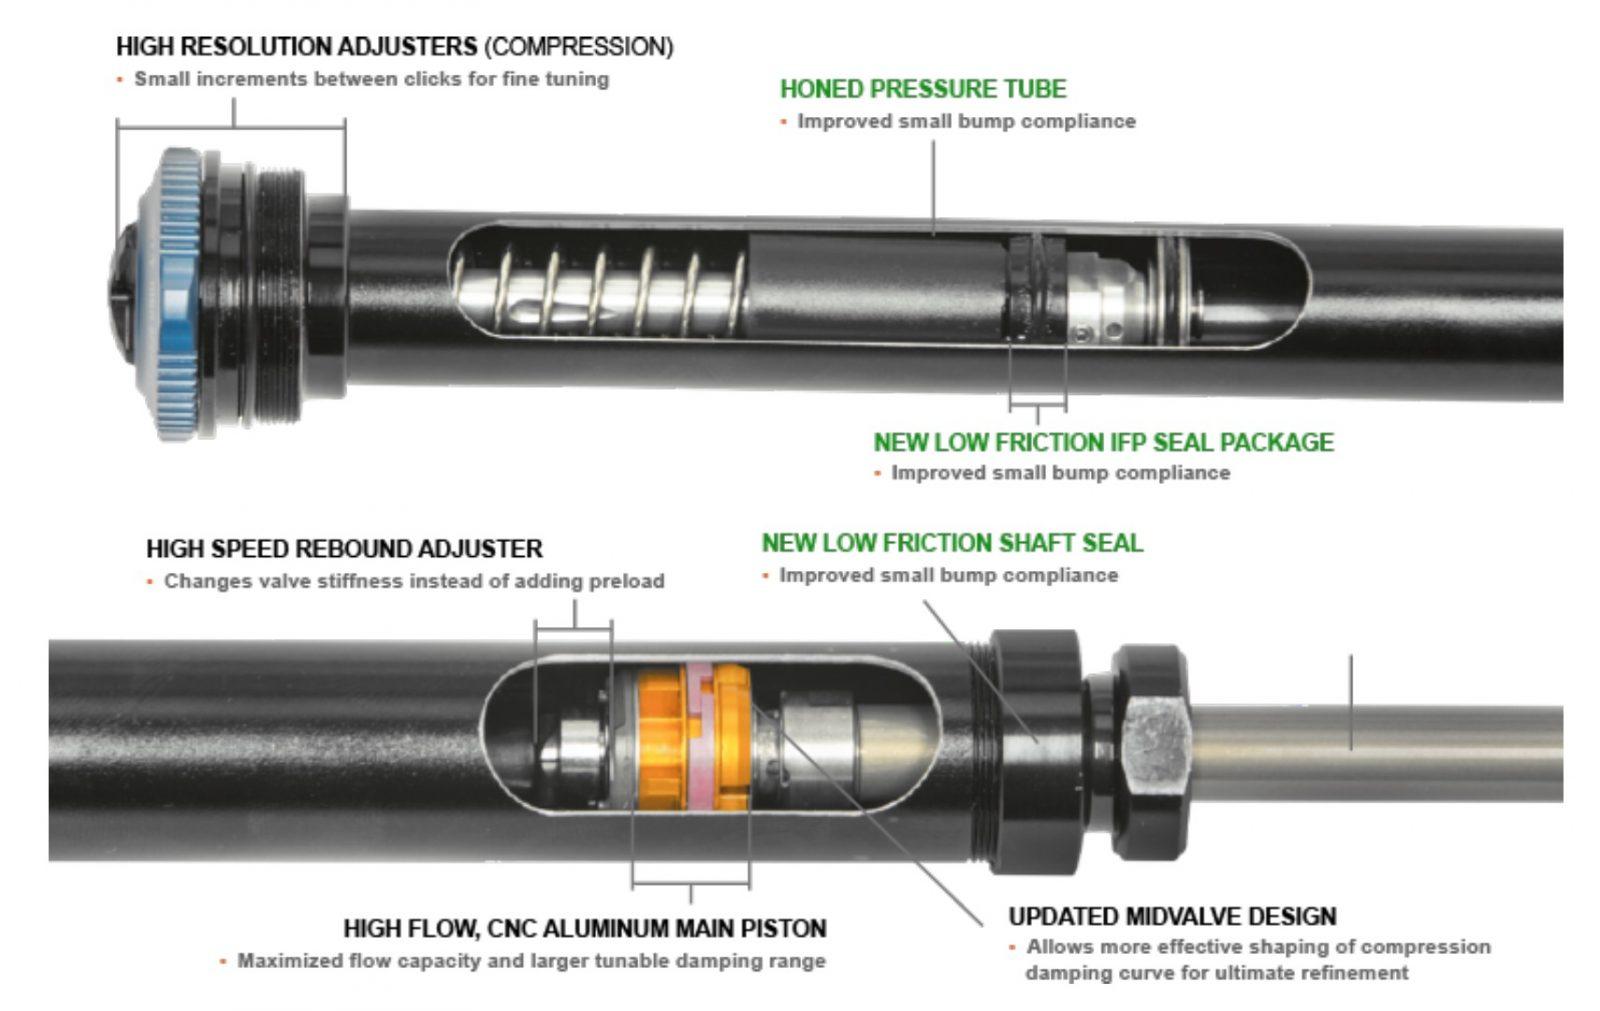 MTB-MAG COM - Mountain Bike Magazine | [Tested] New Fox 36 Grip2